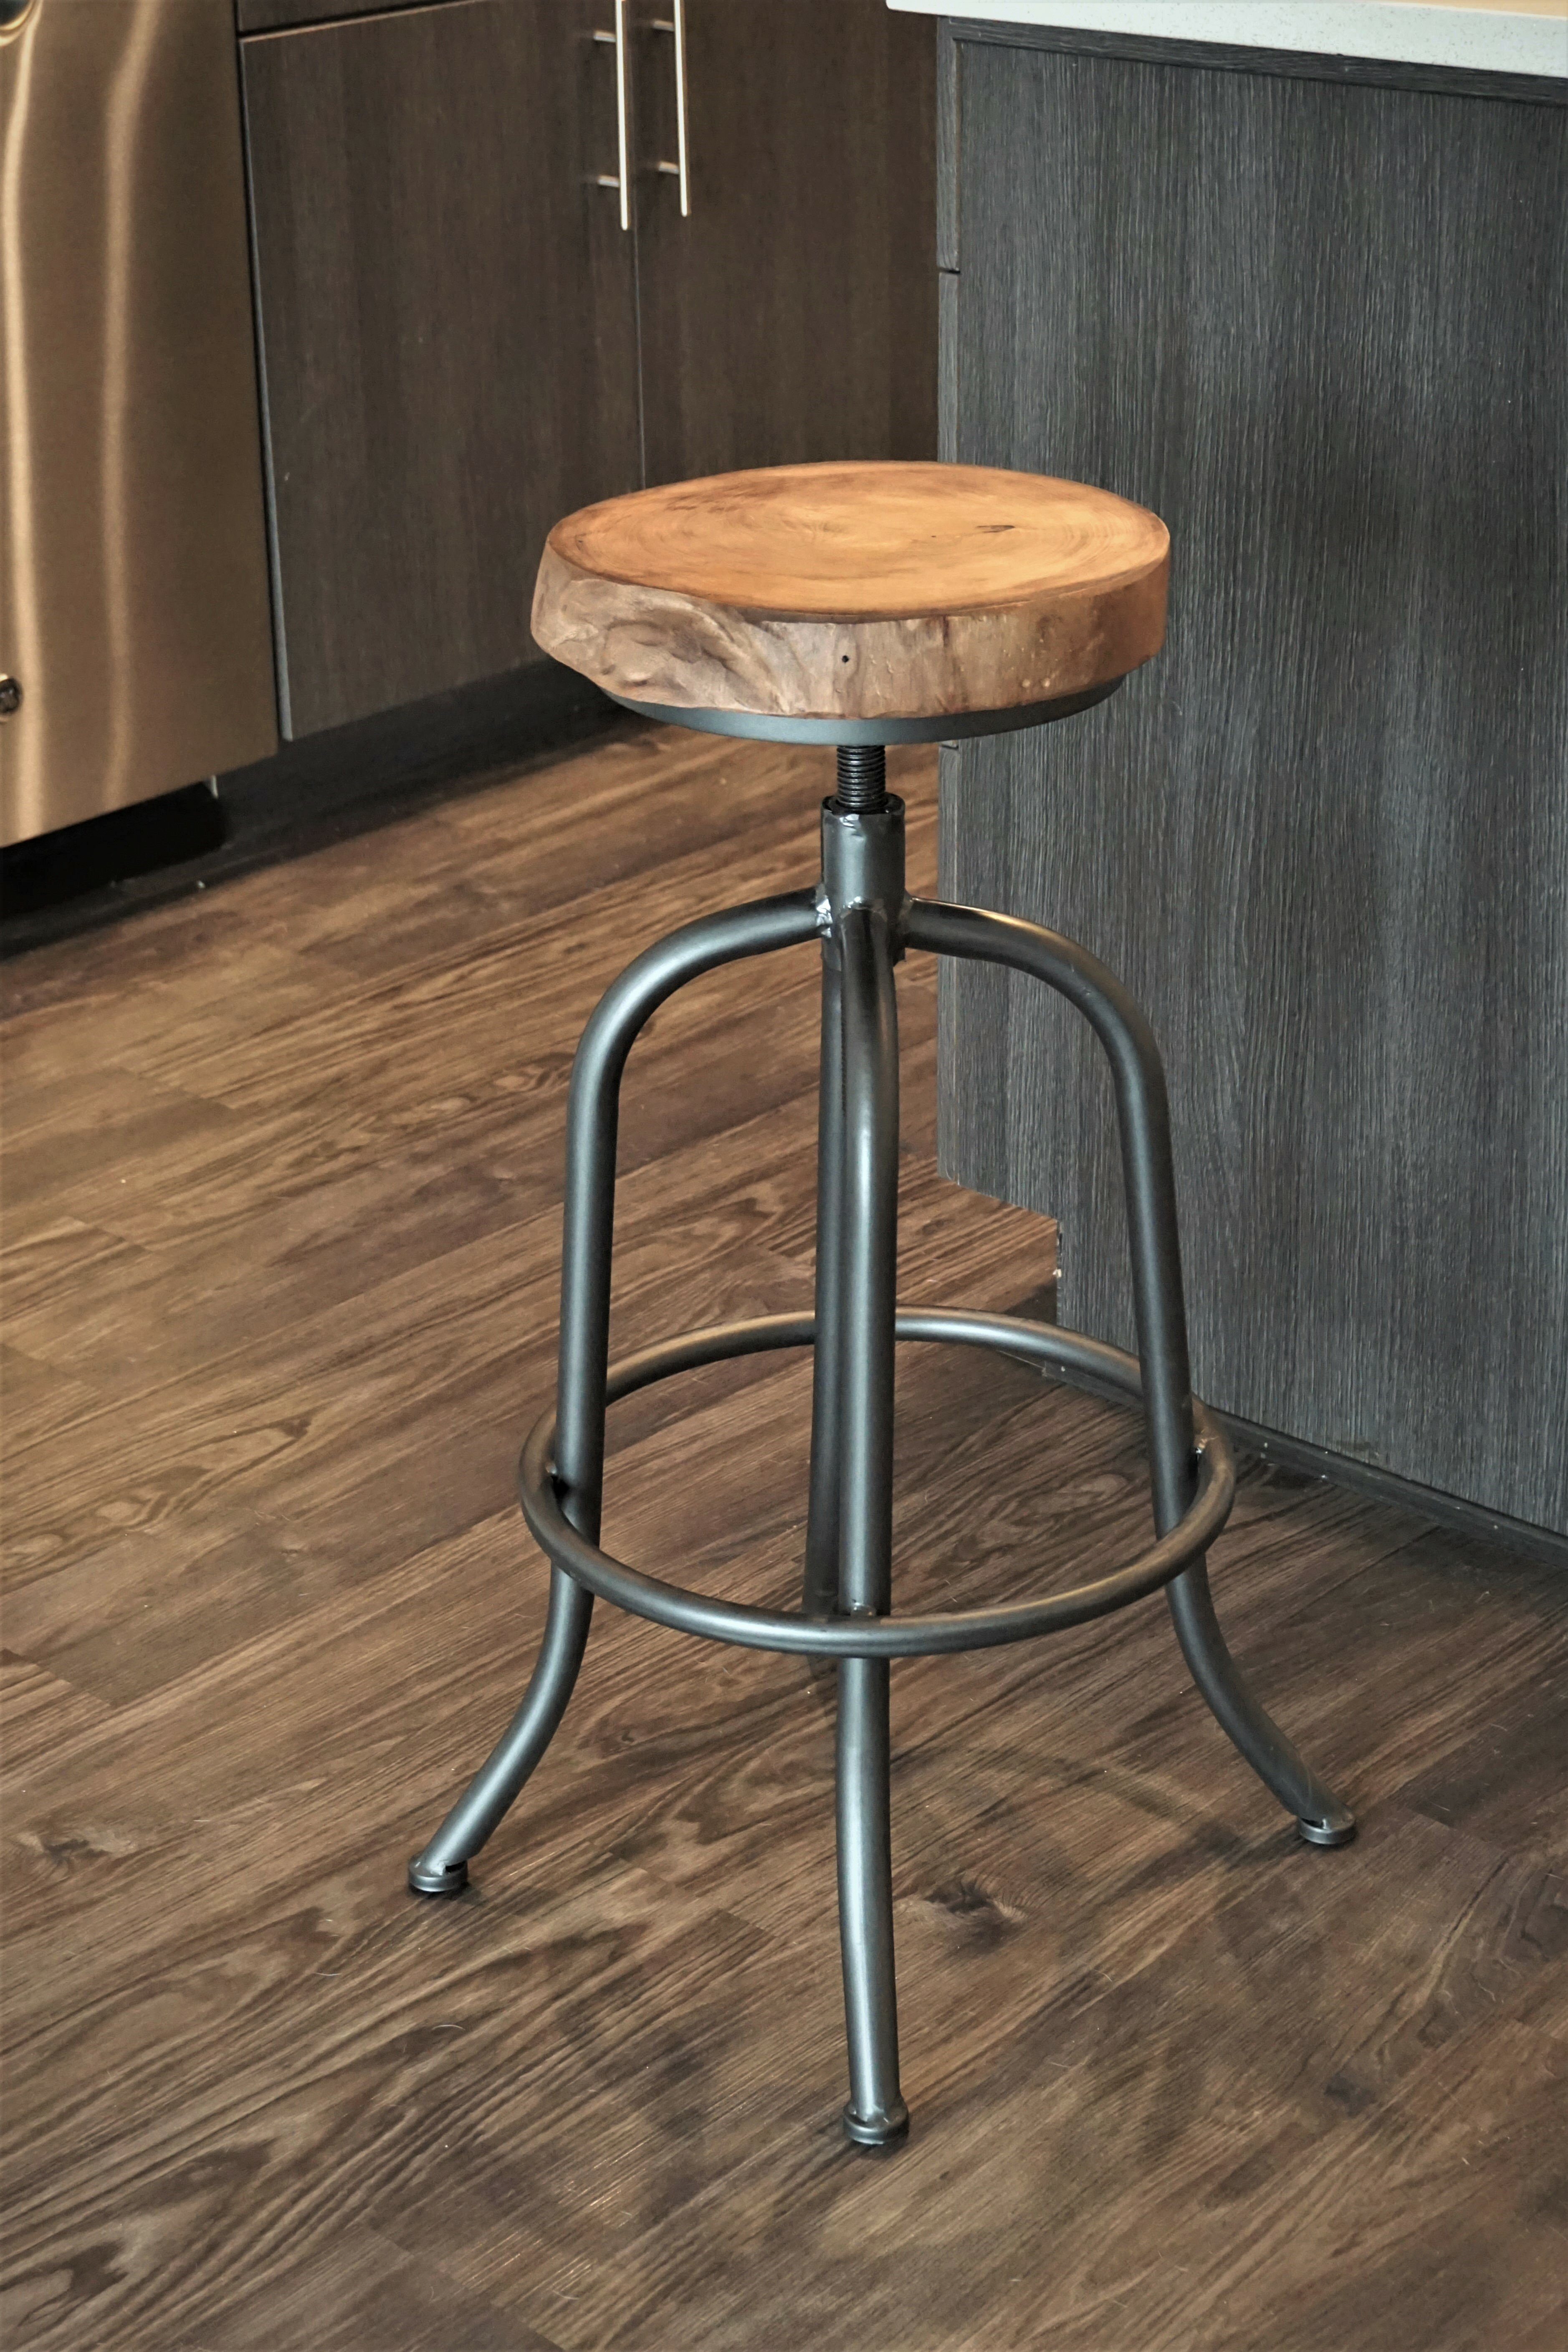 Super Ilsa 28 Swivel Bar Stool Gamerscity Chair Design For Home Gamerscityorg